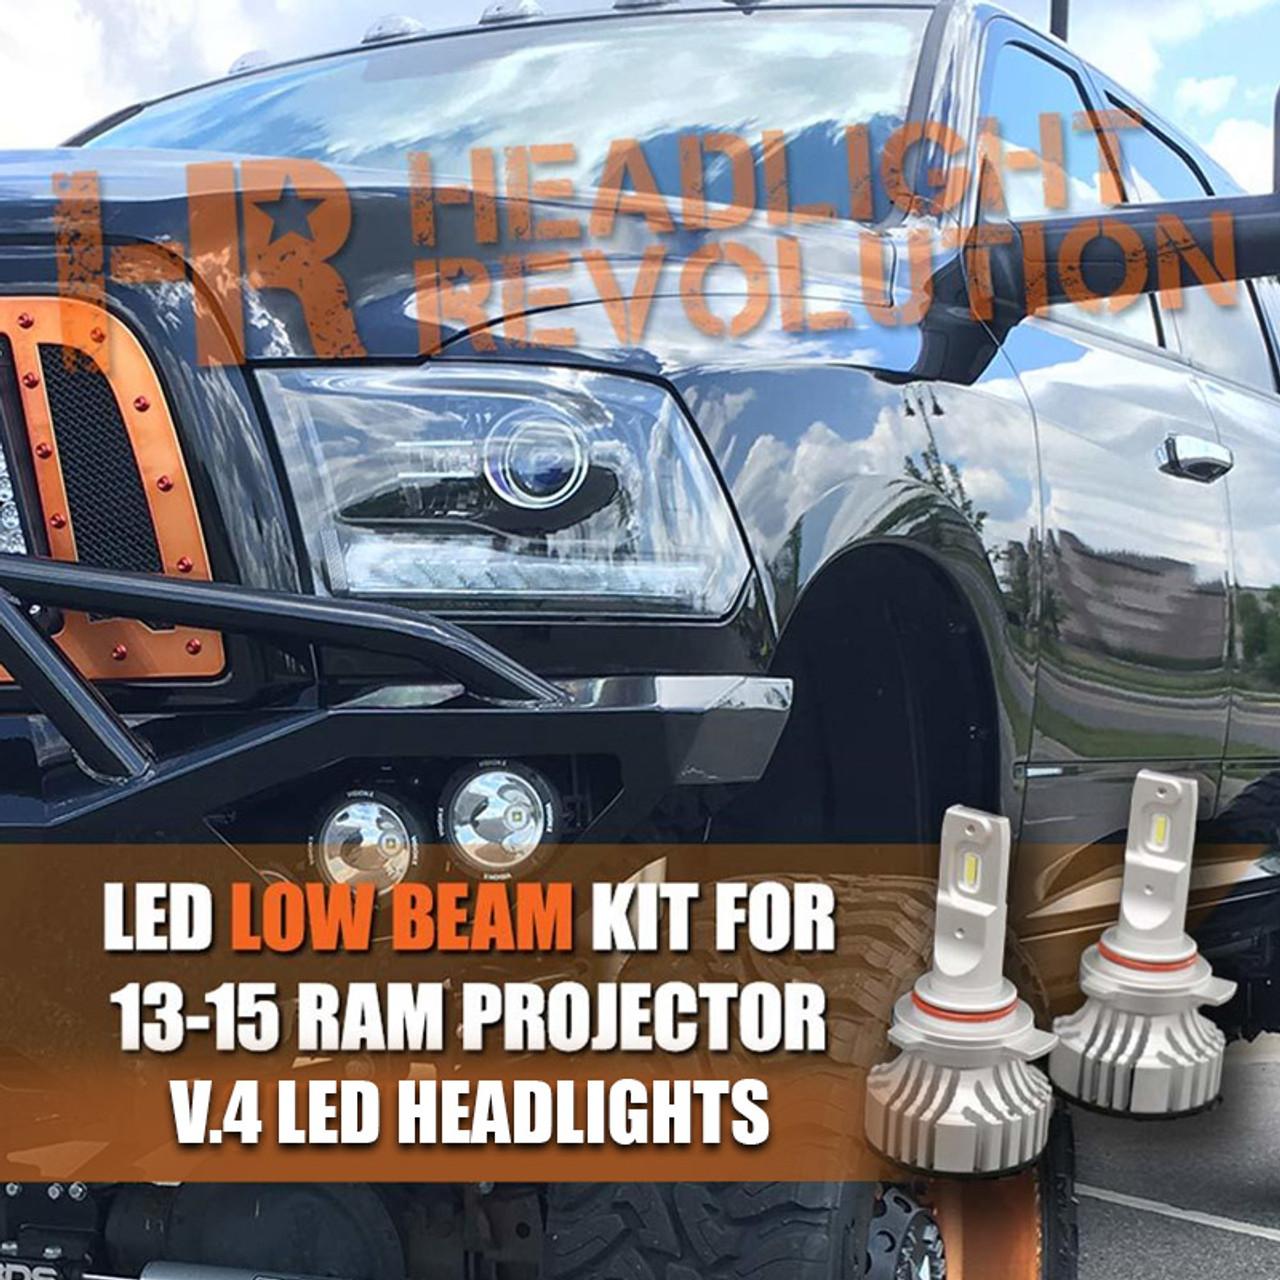 Renault Latitude Blue LED /'Trade/' Wide Angle Side Light Beam Bulbs Pair Upgrade